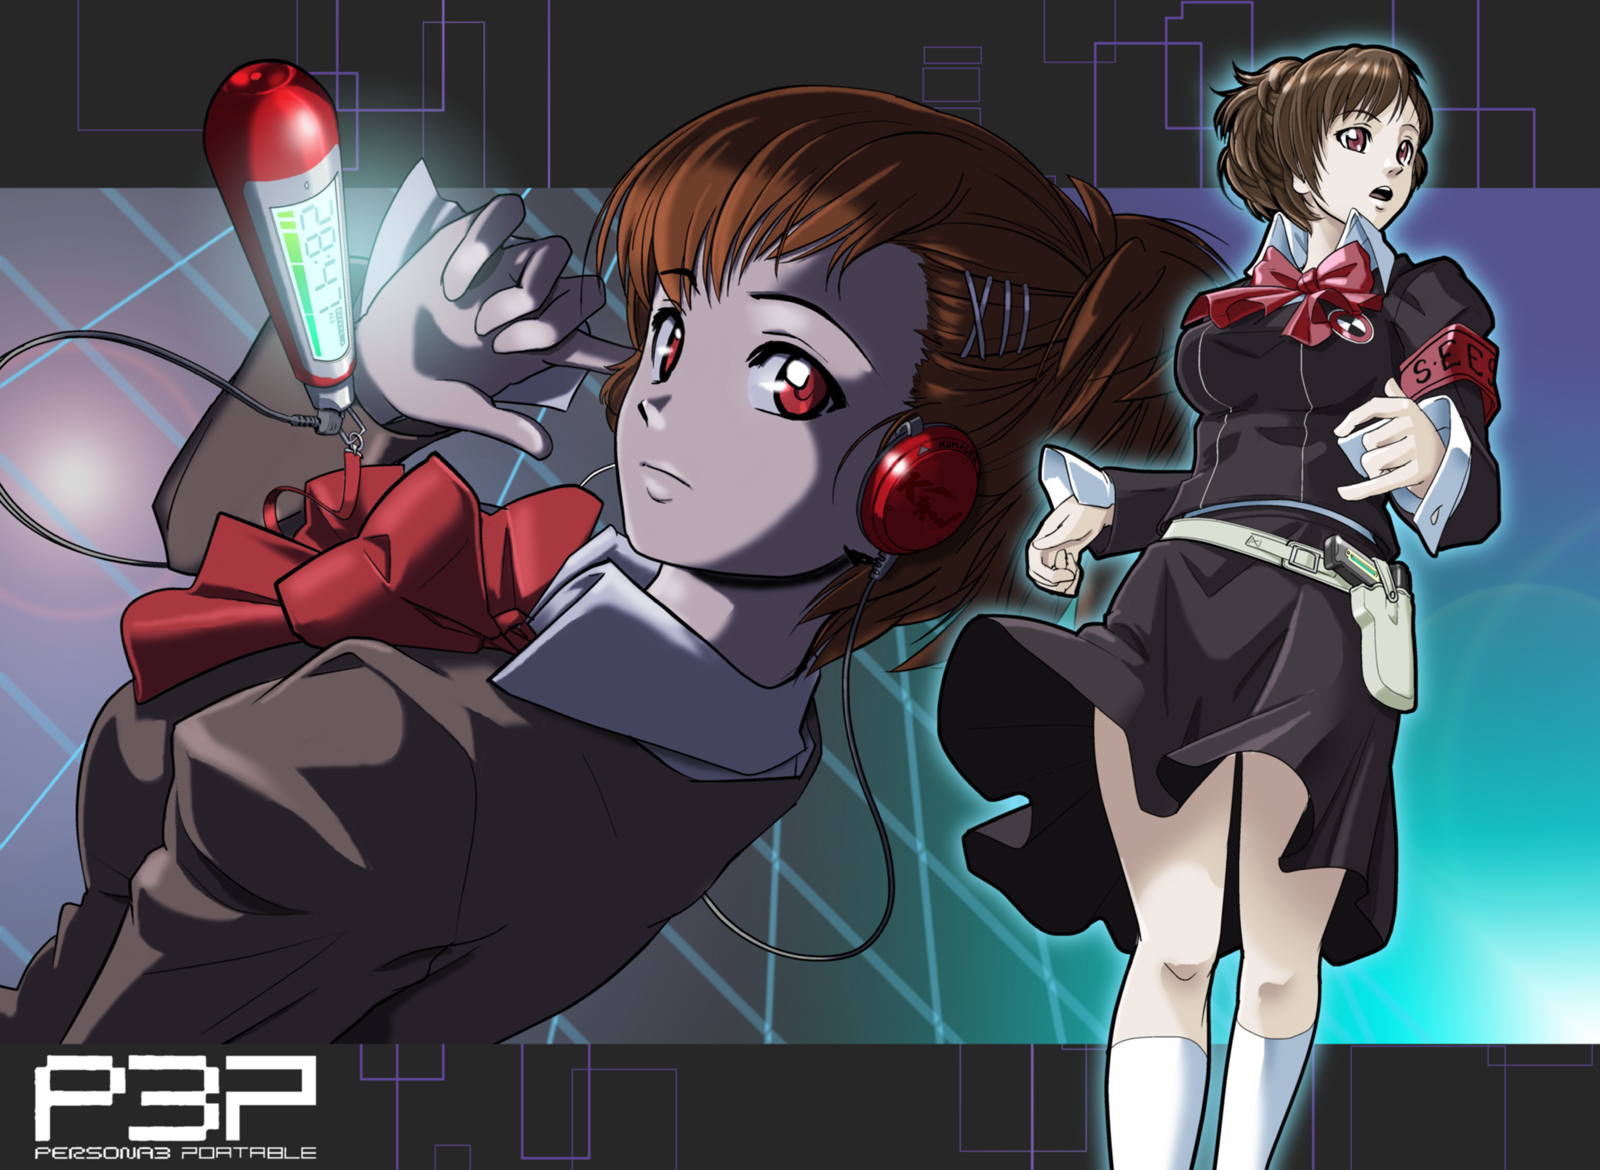 Protagonist Persona 3 Protagonist Persona 3